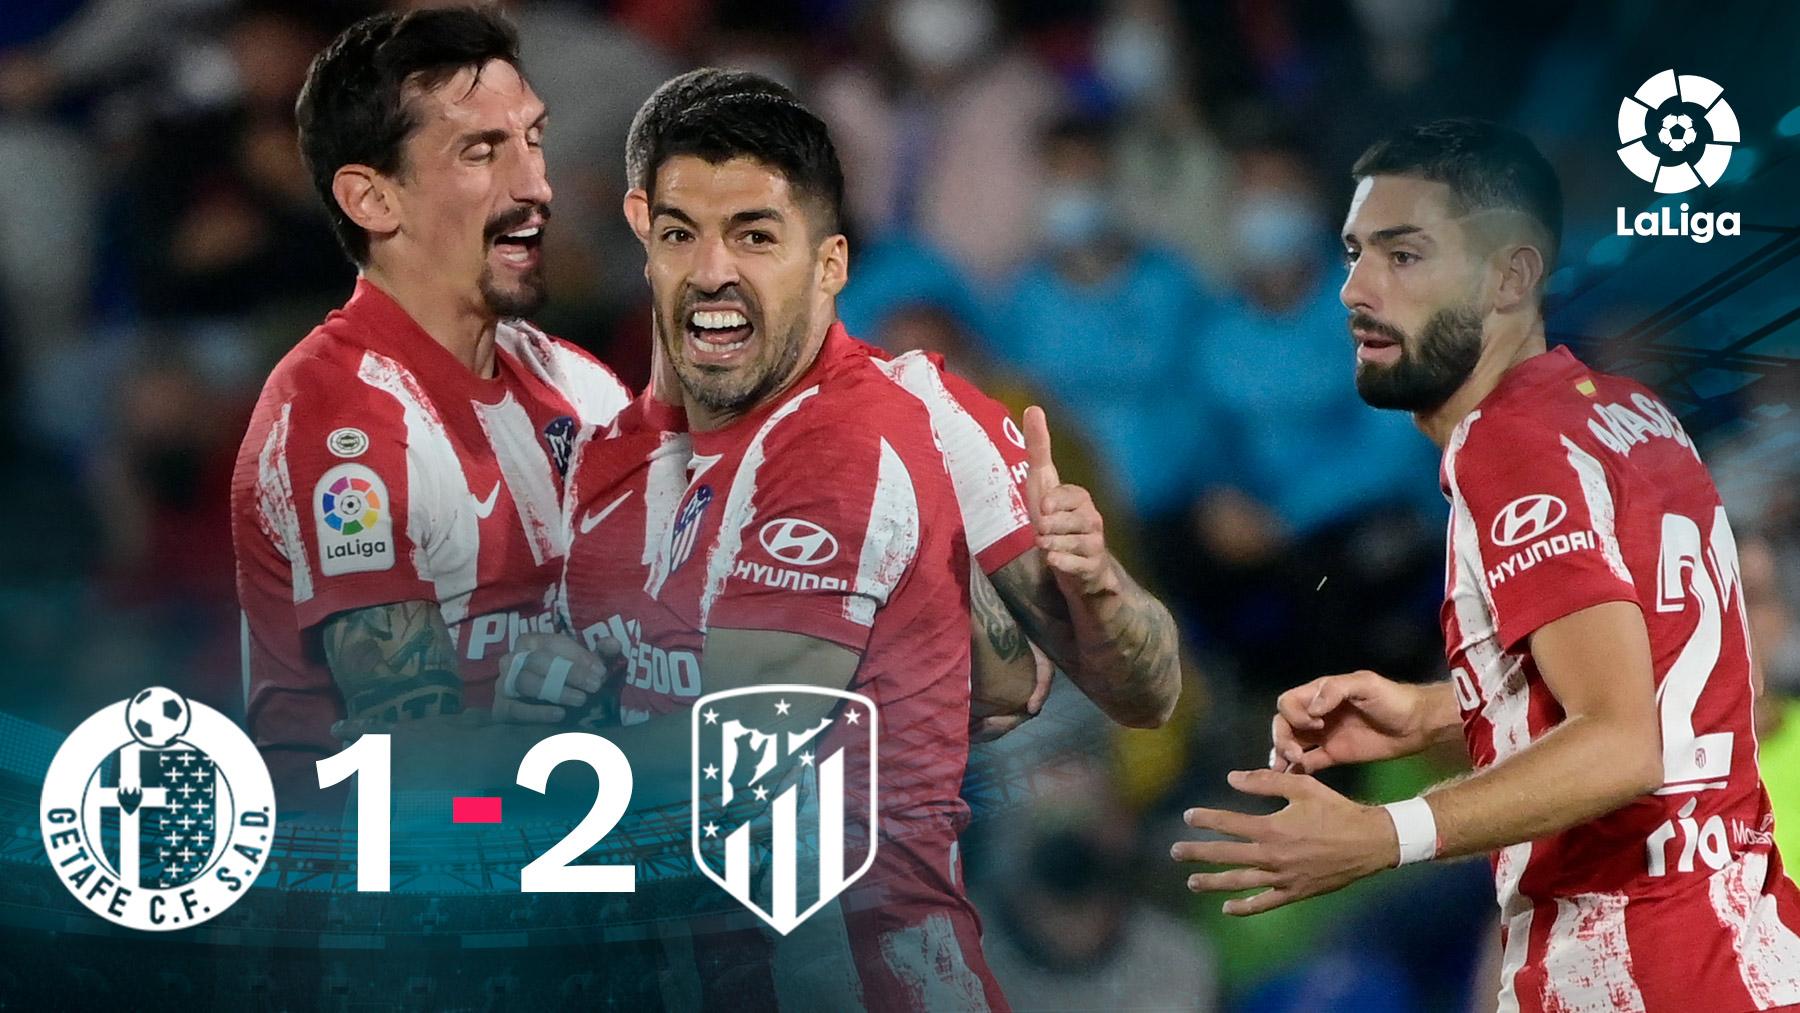 El Atlético venció al Getafe en el Coliseum.